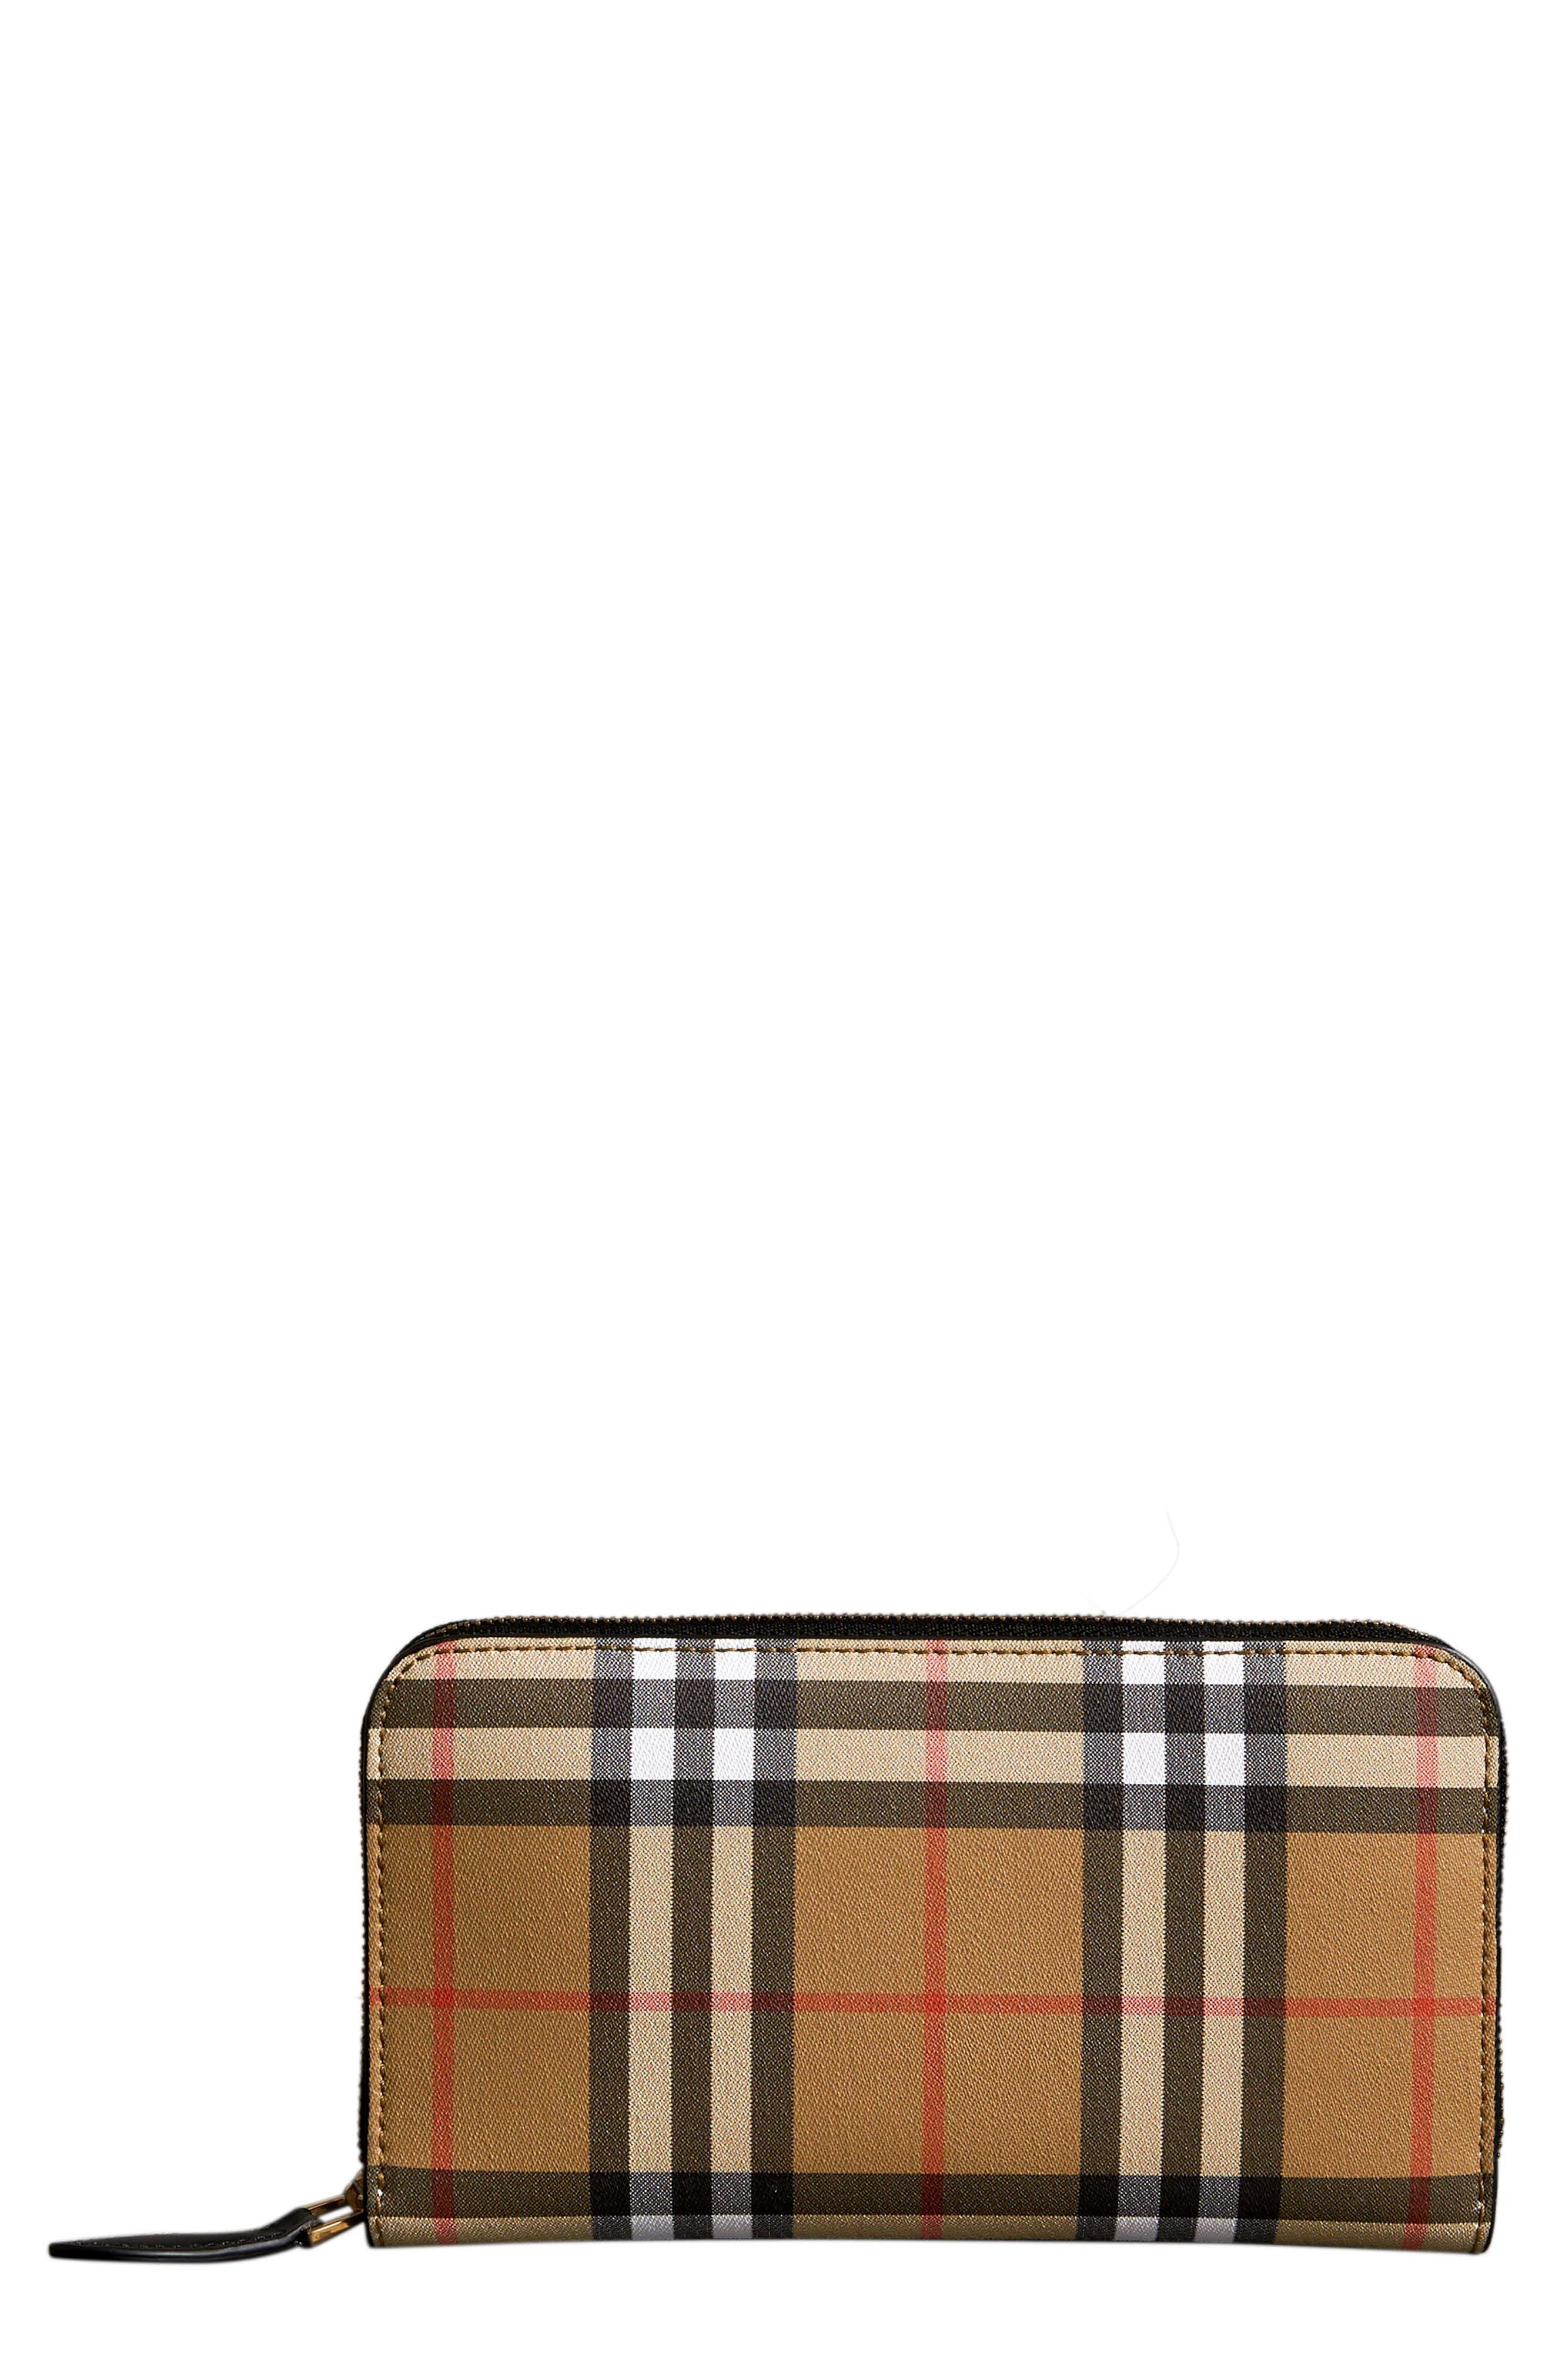 BURBERRY, Elmore Vintage Check Leather Zip Around Wallet, Main thumbnail 1, color, TAN/ BLACK